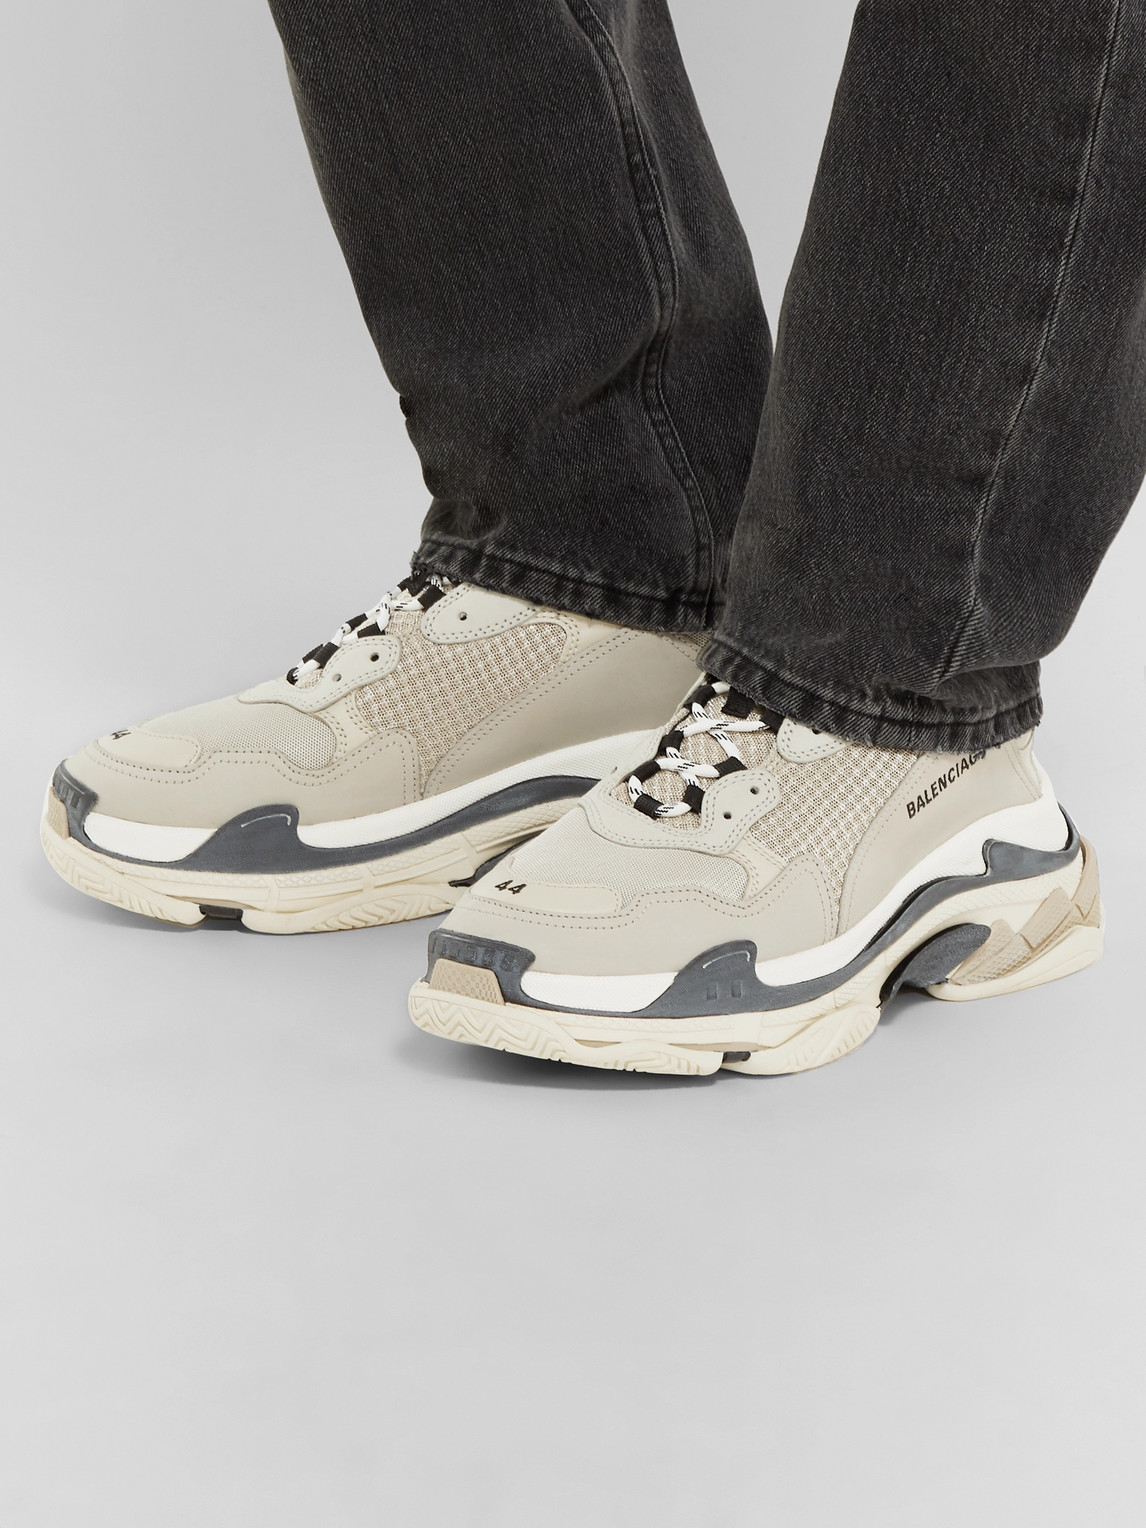 Balenciaga Sneakers TRIPLE S MESH, NUBUCK AND LEATHER SNEAKERS